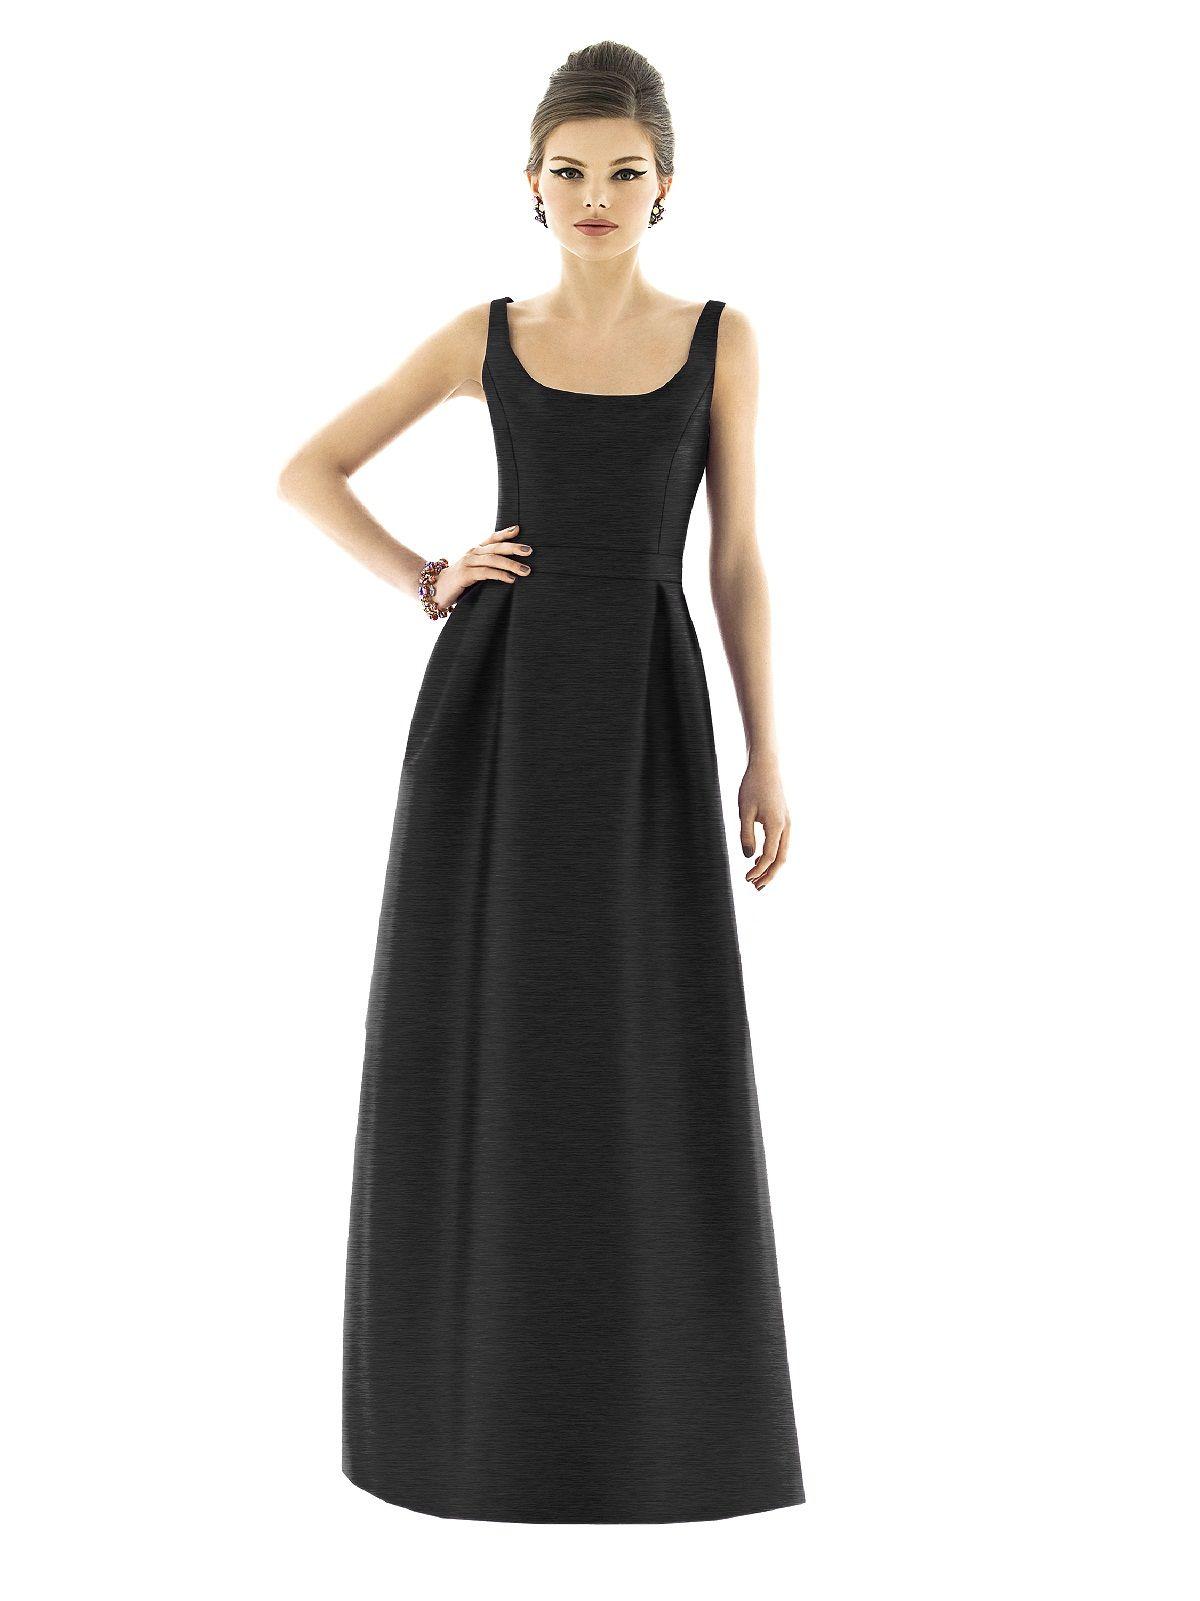 Reminds me of audrey hepburn recital dress idea recital gowns reminds me of audrey hepburn recital dress idea ombrellifo Image collections